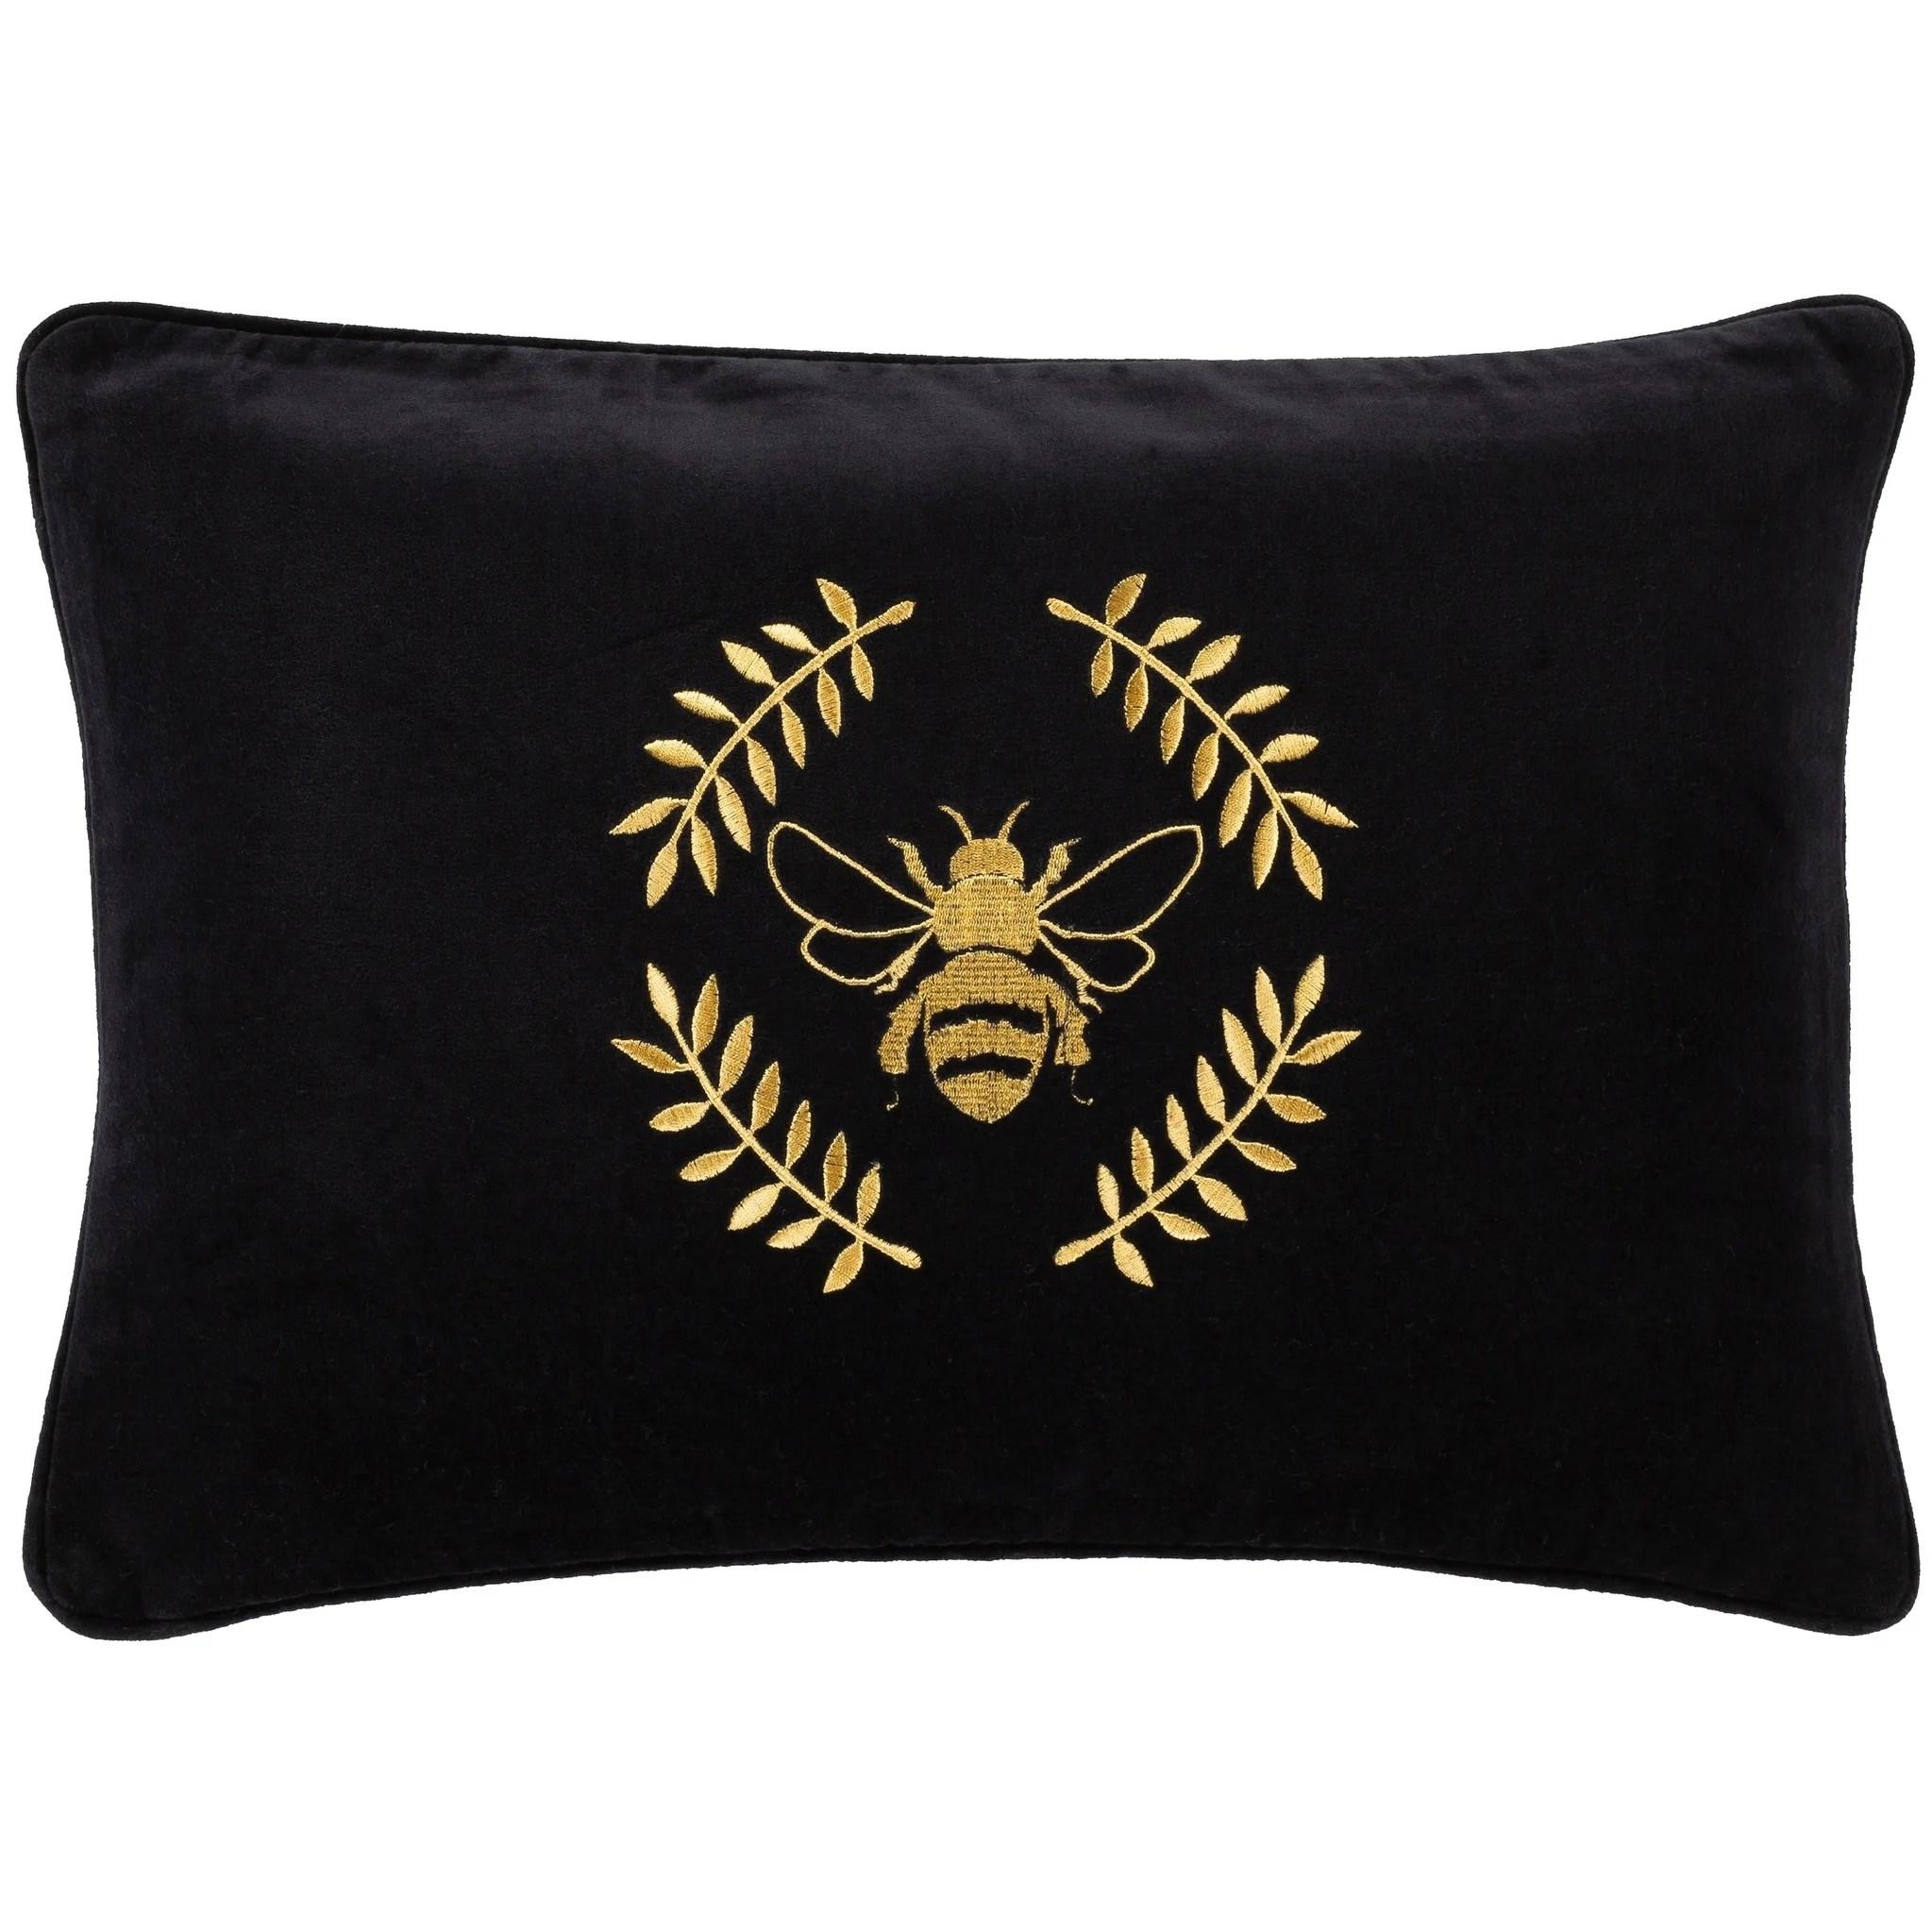 miele bumblebee embroidered velvet 13x20 inch lumbar throw pillow